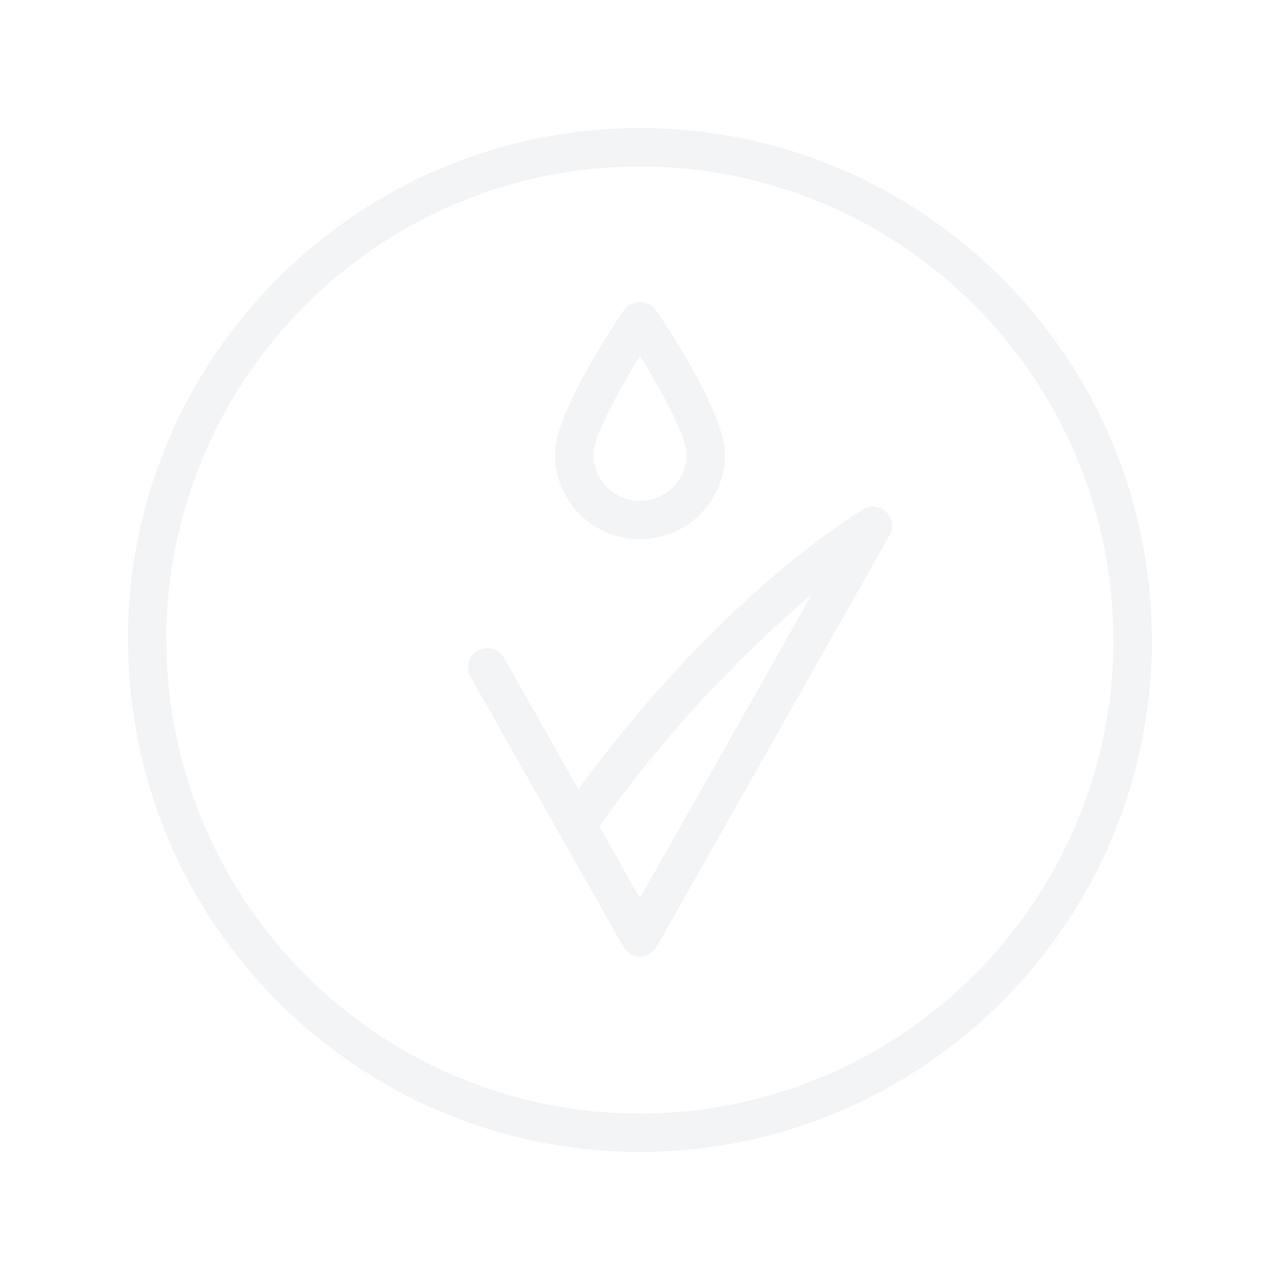 ELIZABETH ARDEN 8 Hour Cream Lip Protectant Stick SPF15 3.7g